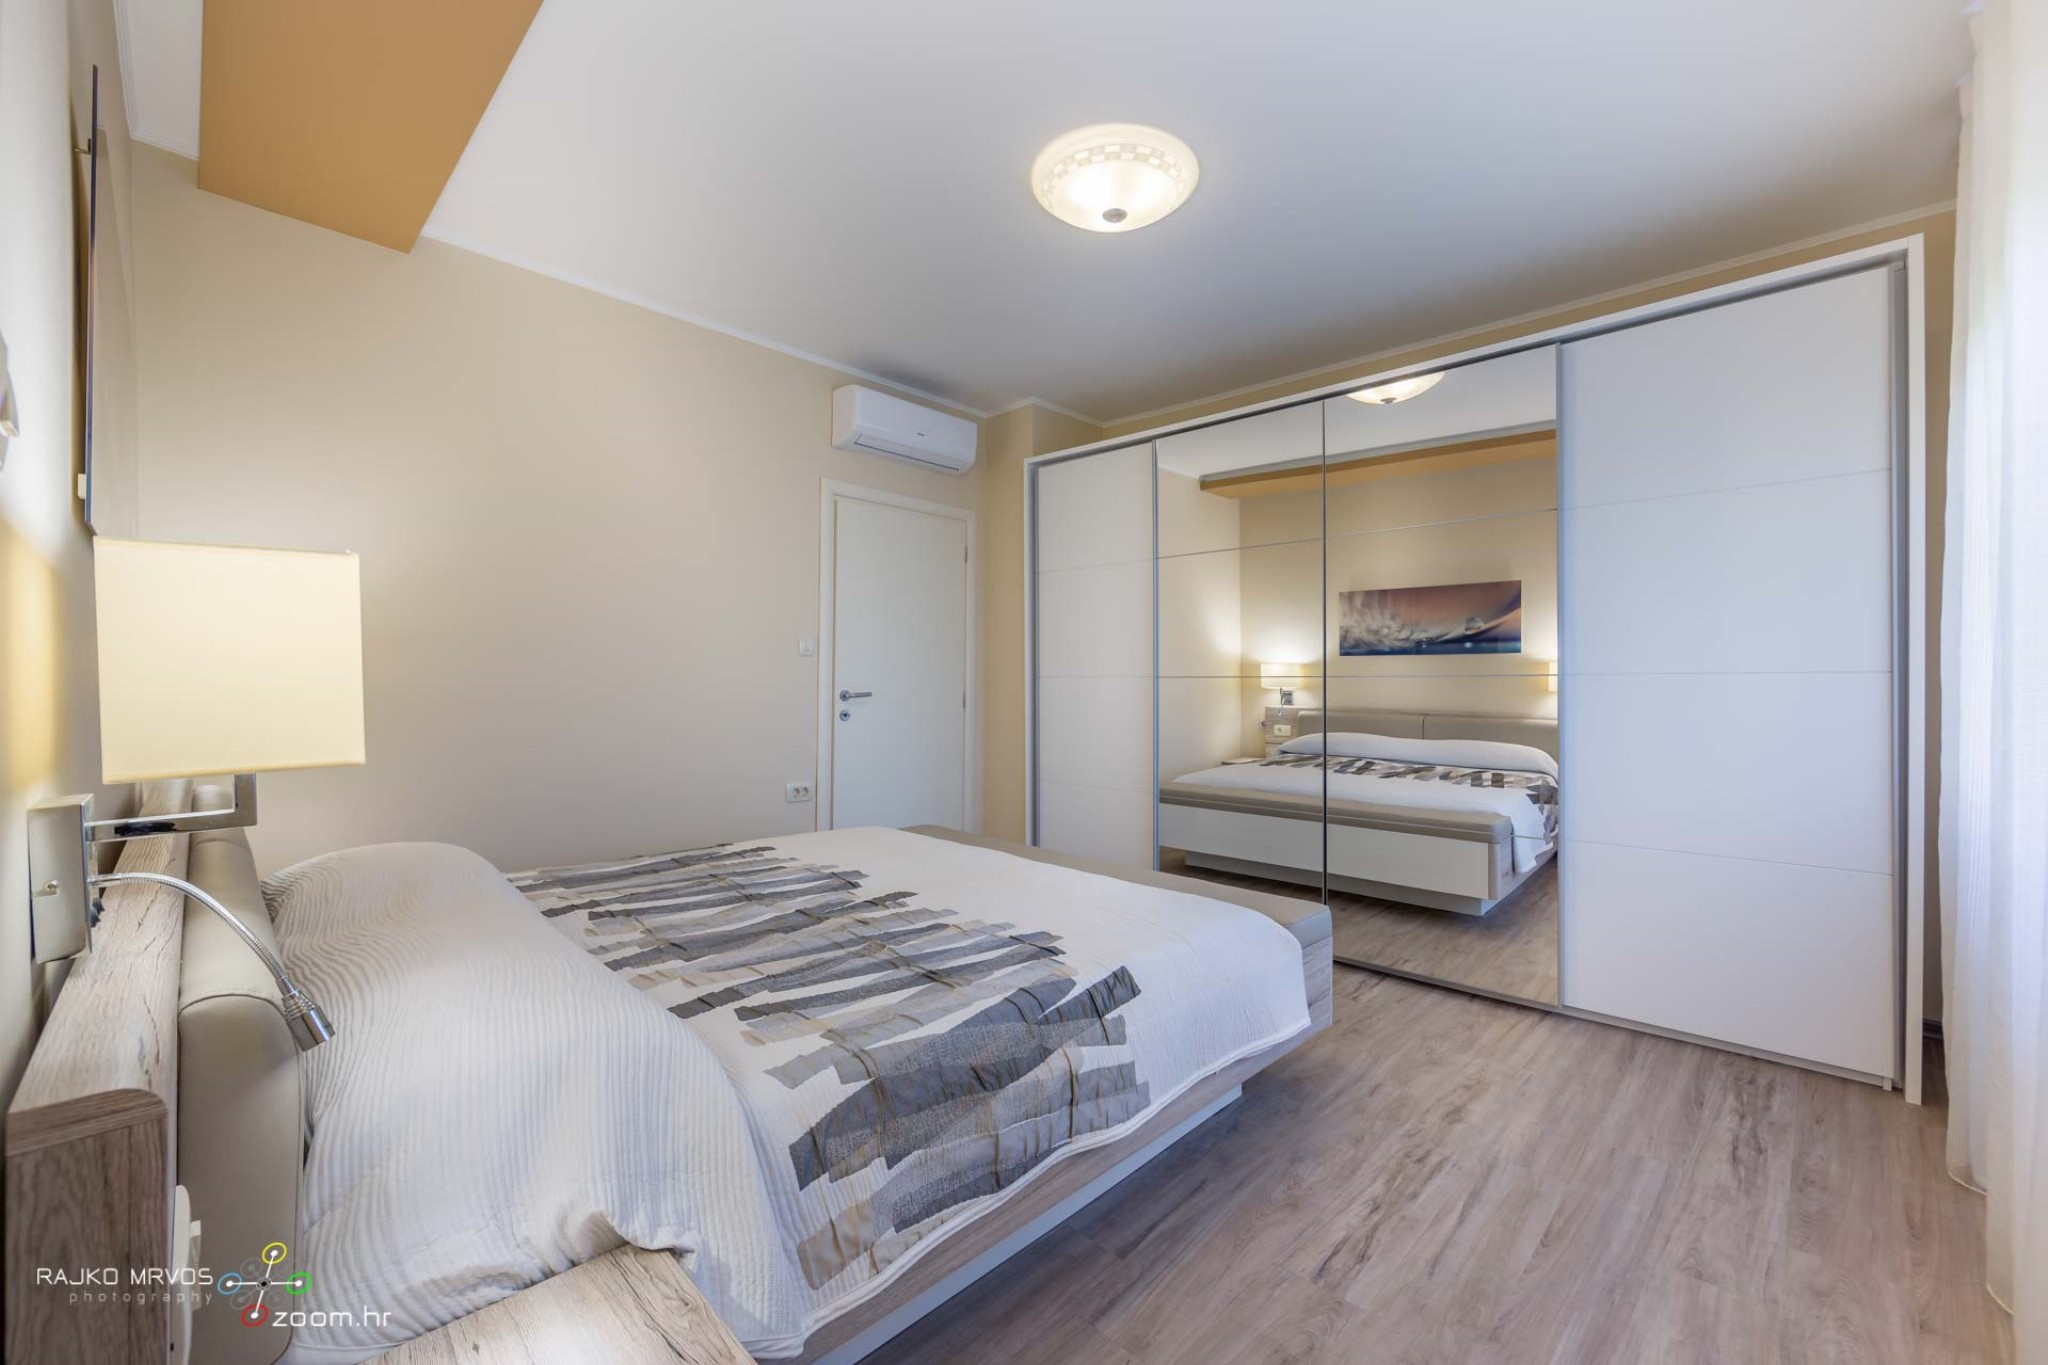 fotografiranje-interijera-fotograf-eksterijera-vila-apartmana-kuca-apartmani-Dujmic-7